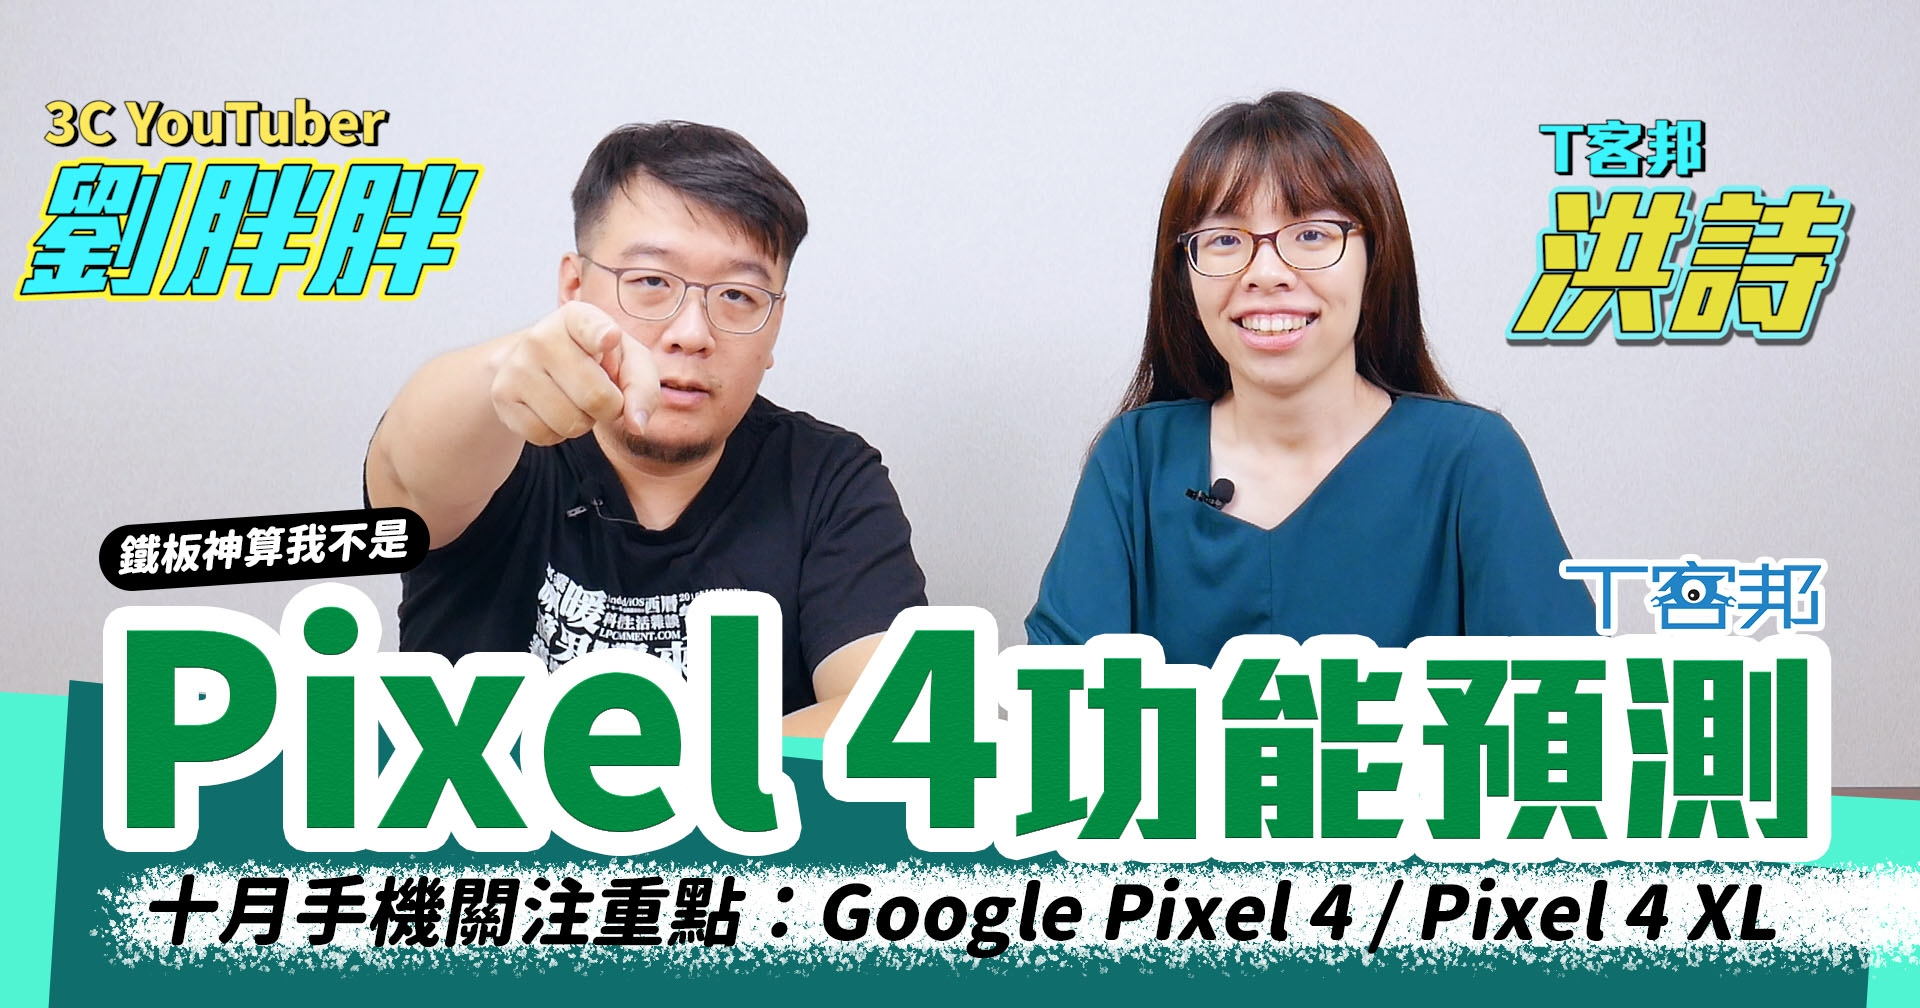 Google Pixel 4 鏂版満鍔熻兘鏁寸悊锛岄殧绌烘墜鍔挎搷浣滐紵鏇村己澶х殑澶滄媿锛熸柊浜哄伐鏅鸿兘澶勭悊鍣紵